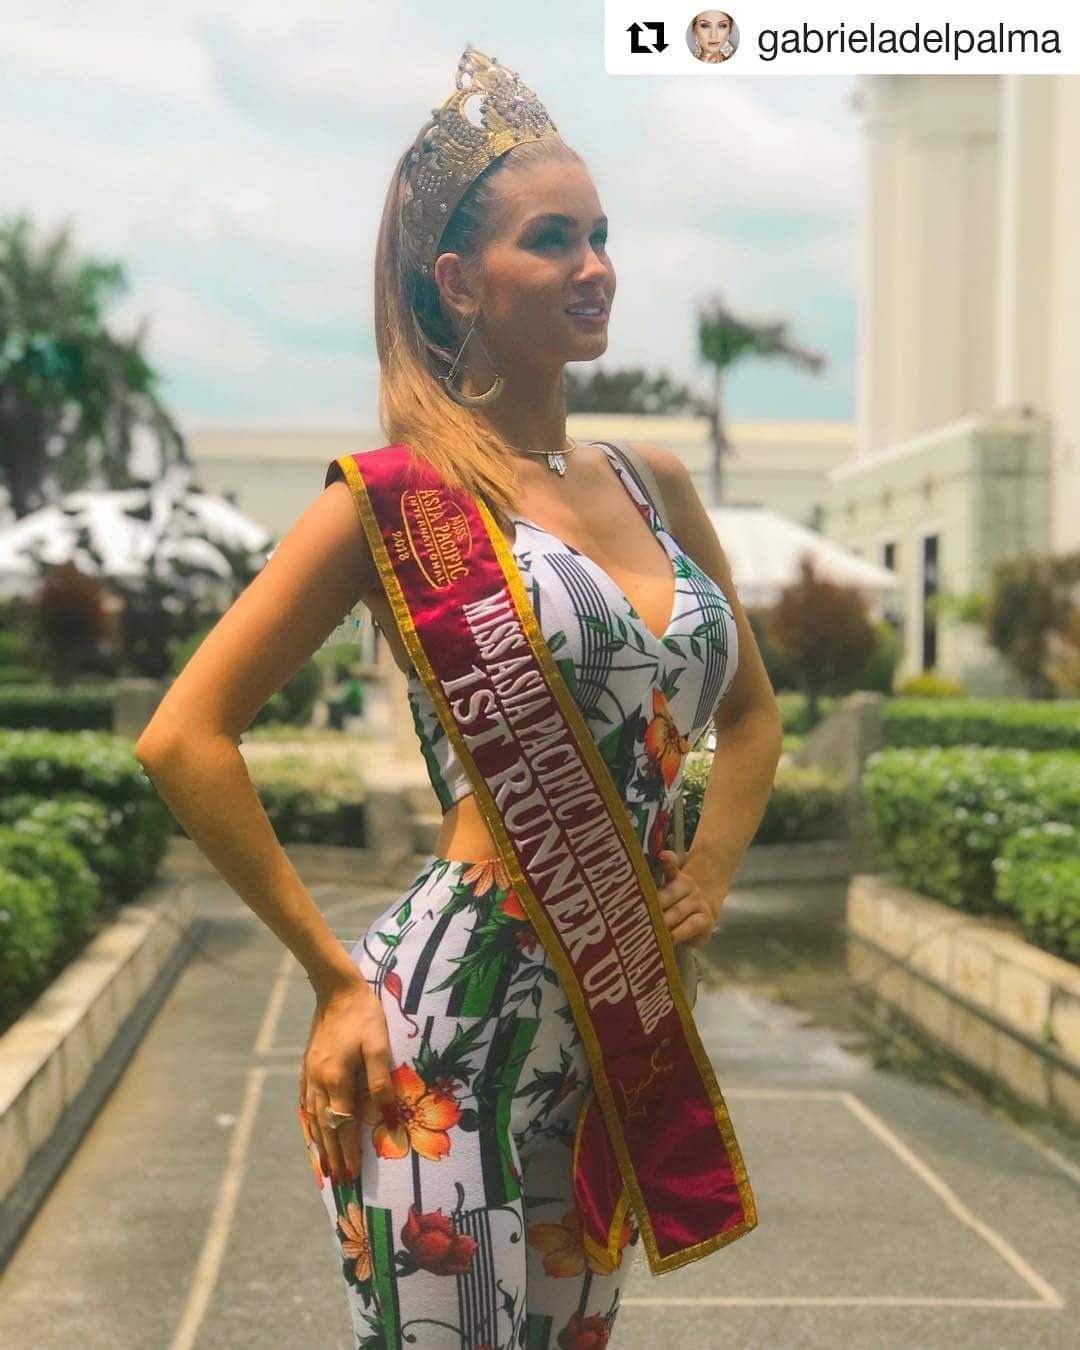 gabriela palma, miss brasil empresarial 2018. - Página 21 42664910